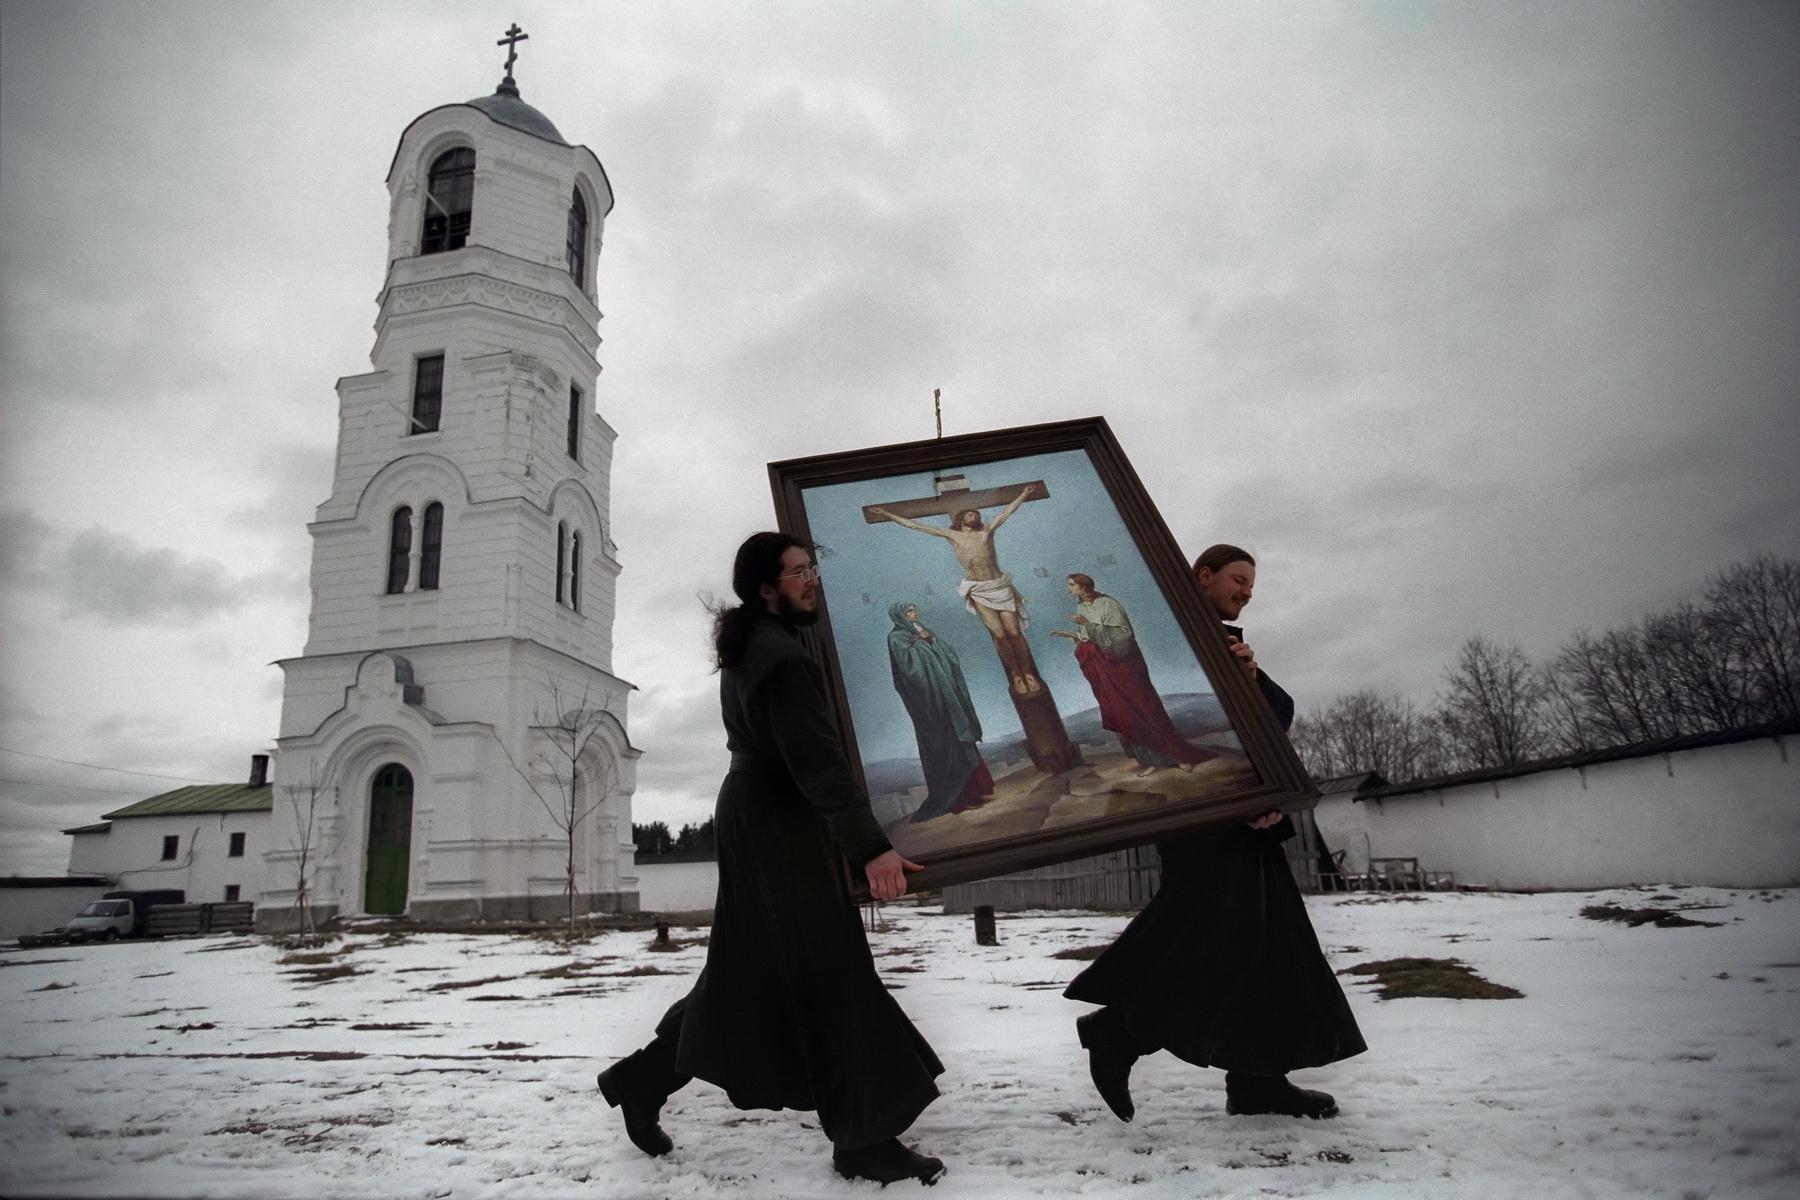 Aleksandro-Svirskyi Monastery, St. Petersburg region, 2002.